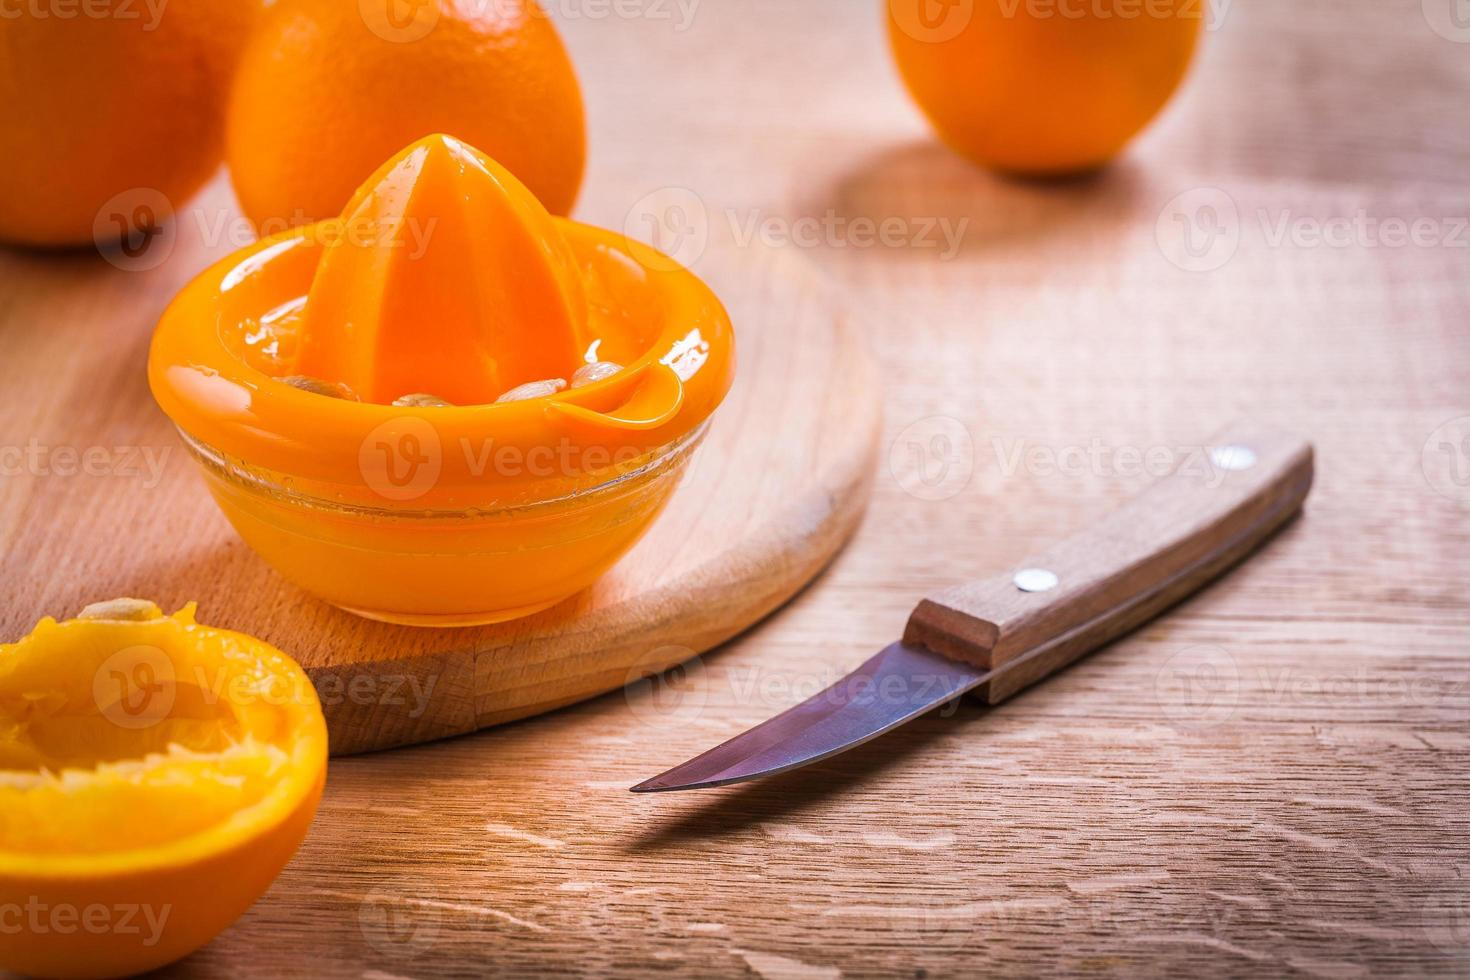 Exprimidor naranja cuchillo en escritorio de madera foto